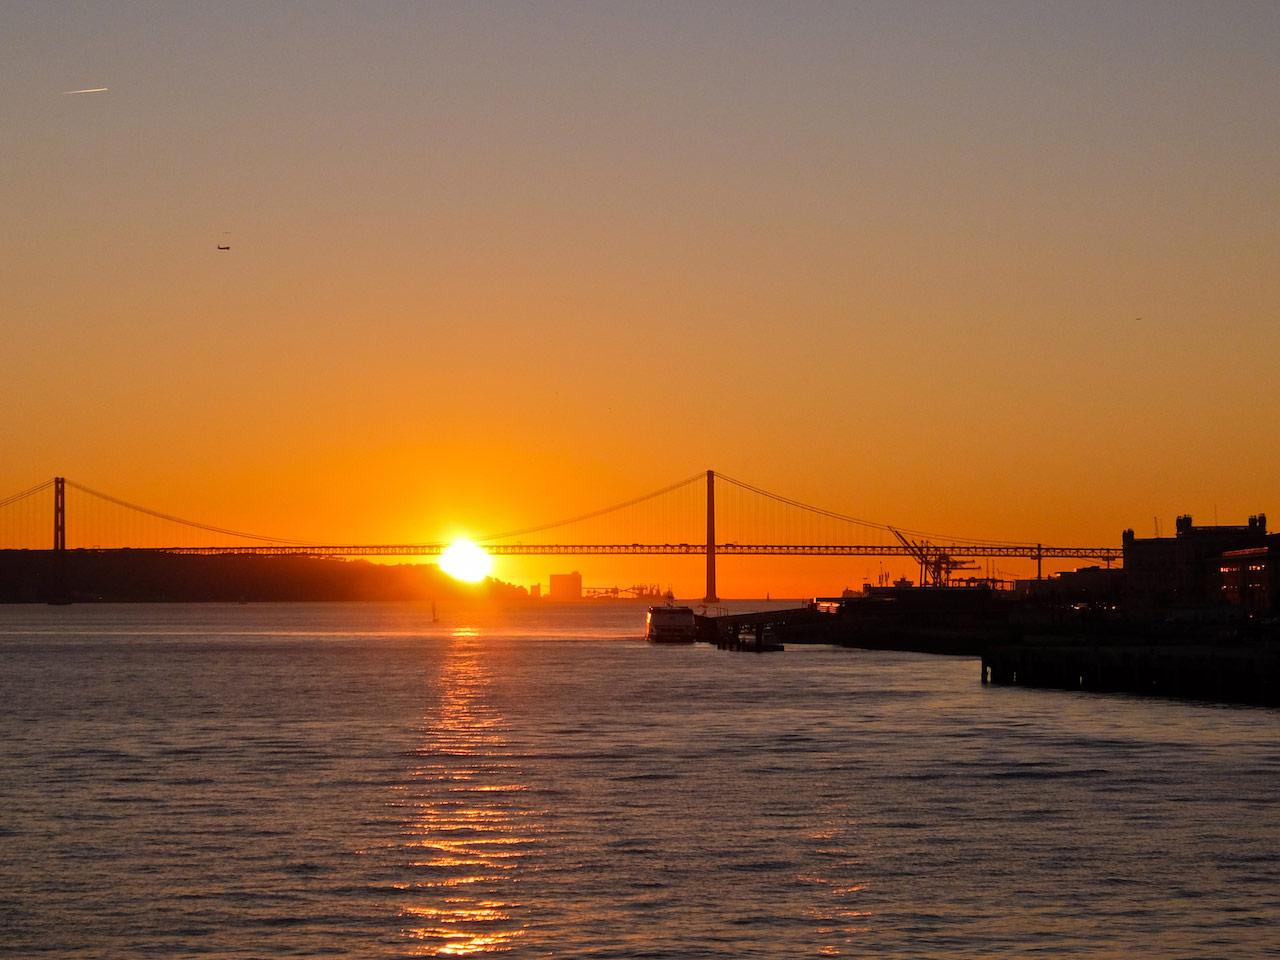 Leaving Lisbon at sunset